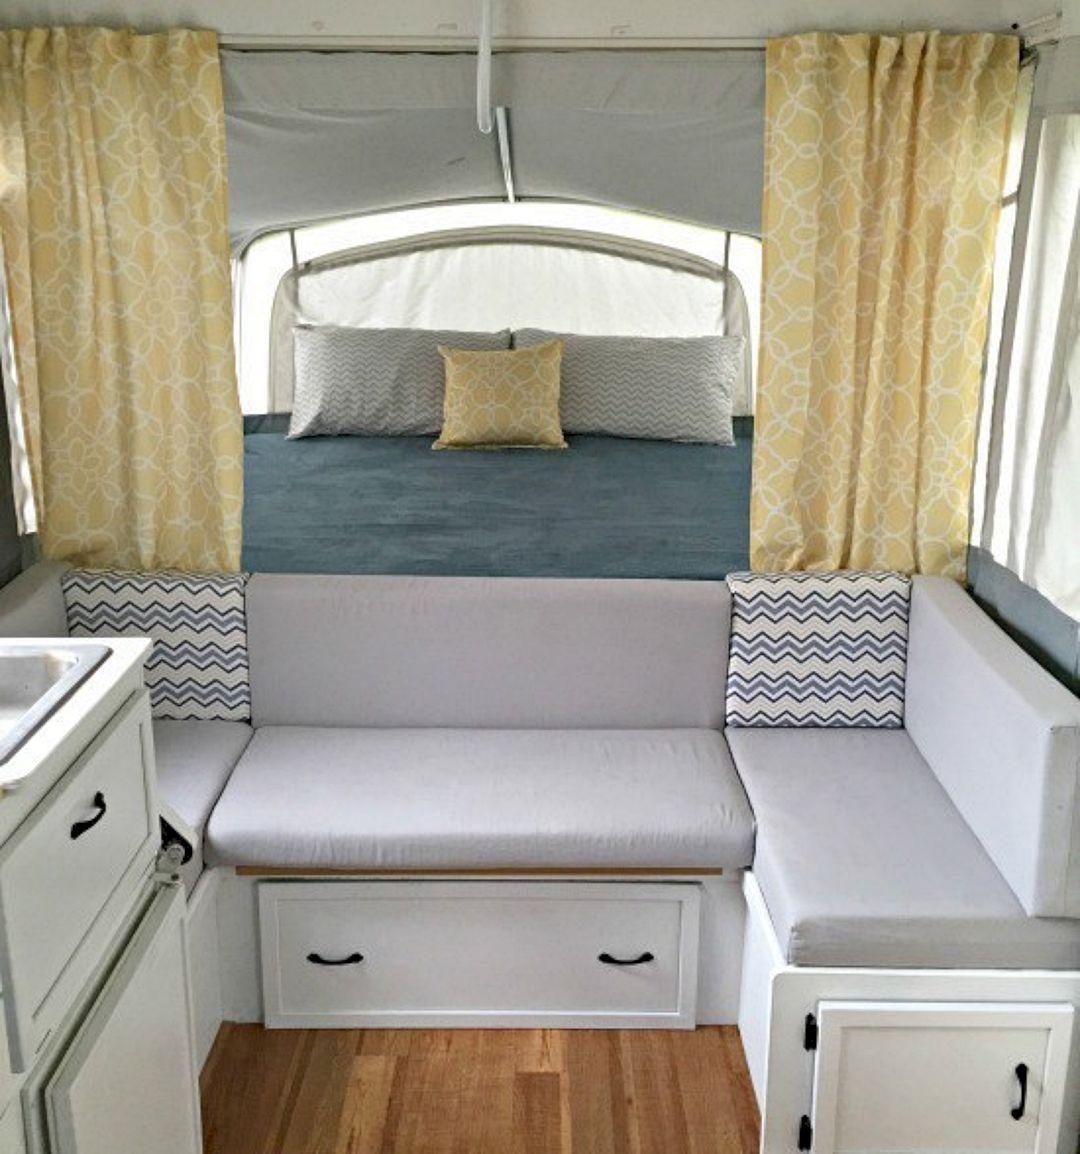 Inspiring 40 Best DIY Remodeled Campers On A Budget Ideas Decoredo 5540 Diy